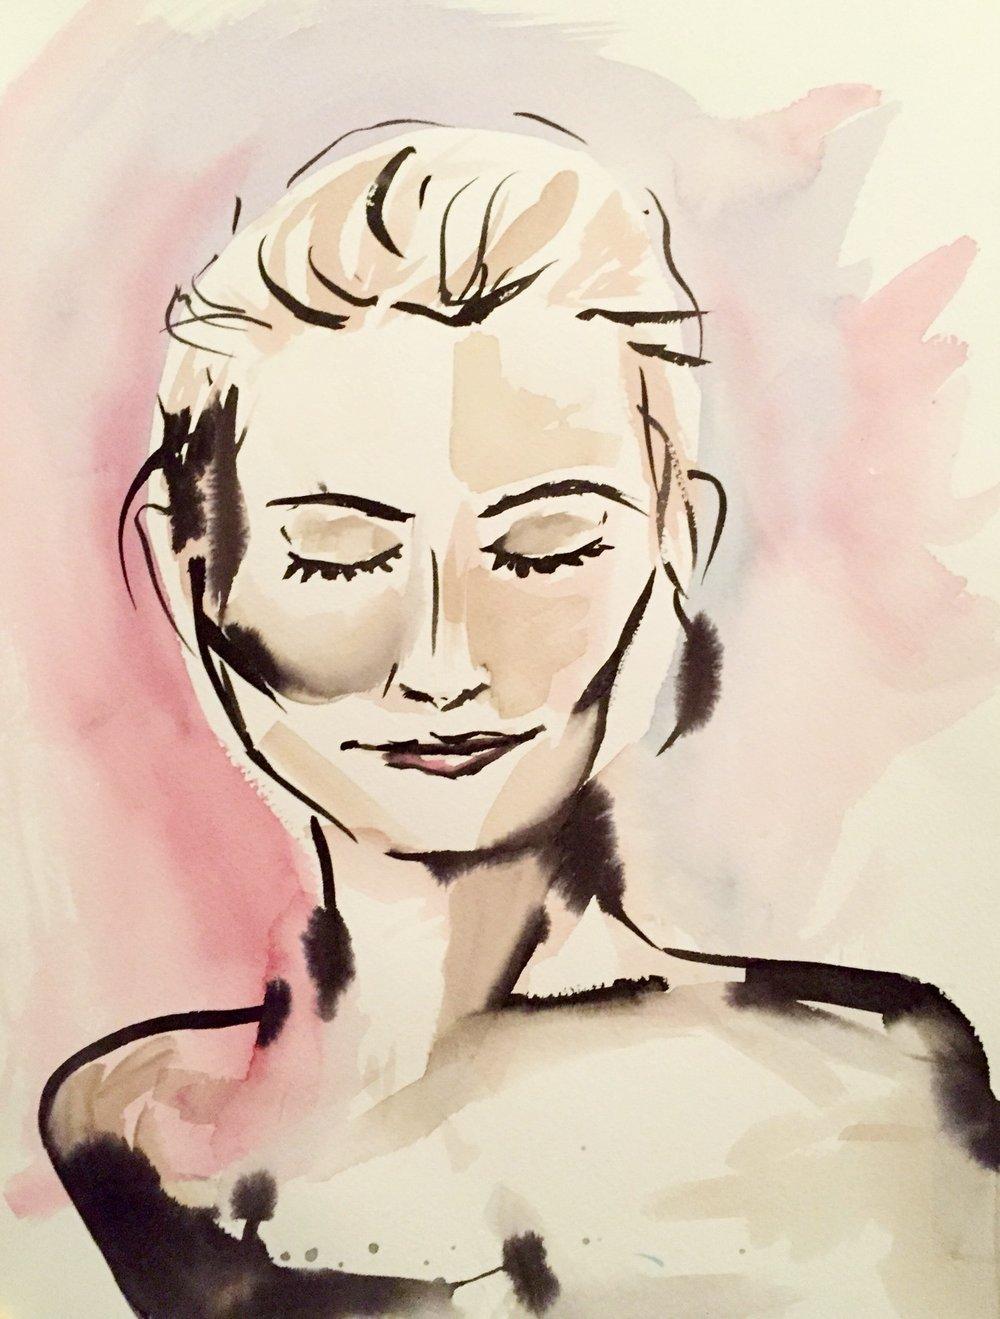 Breath   2016. Watercolor on paper. 11 x 18.